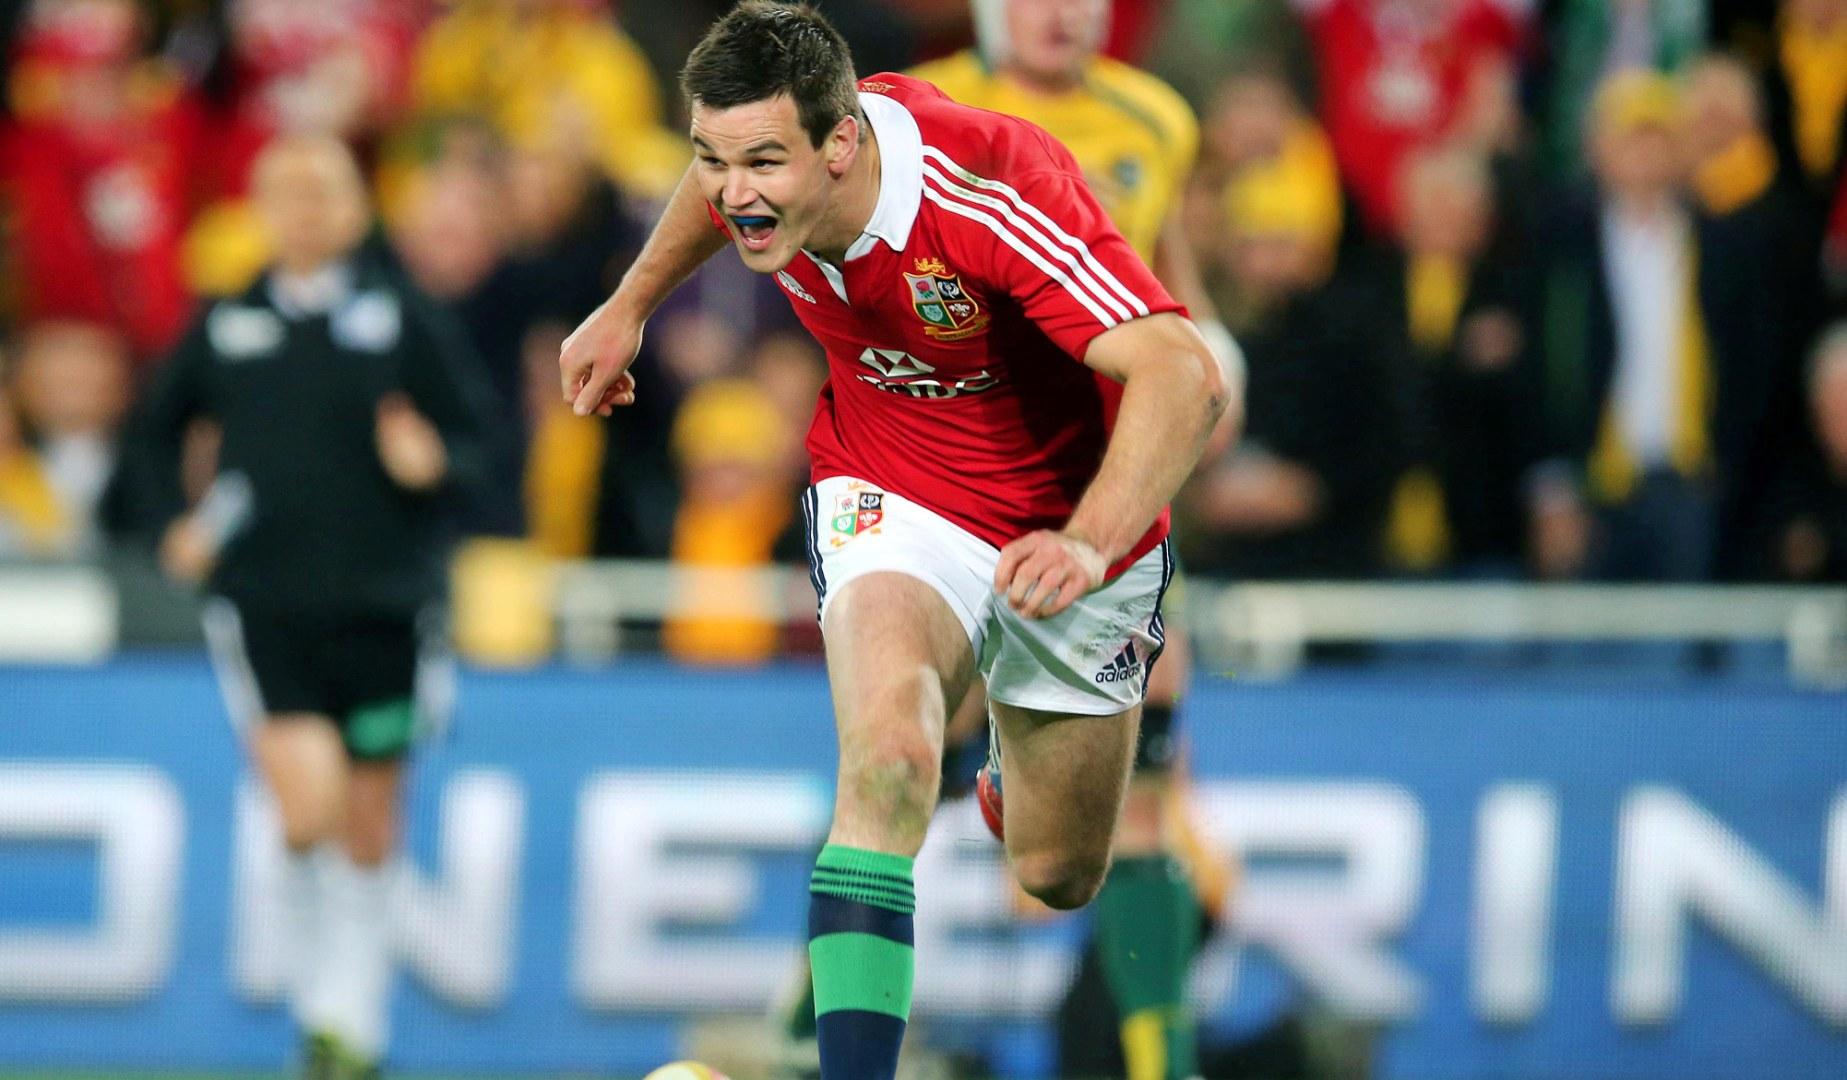 LionsWatch: Sexton, Biggar and Russell return